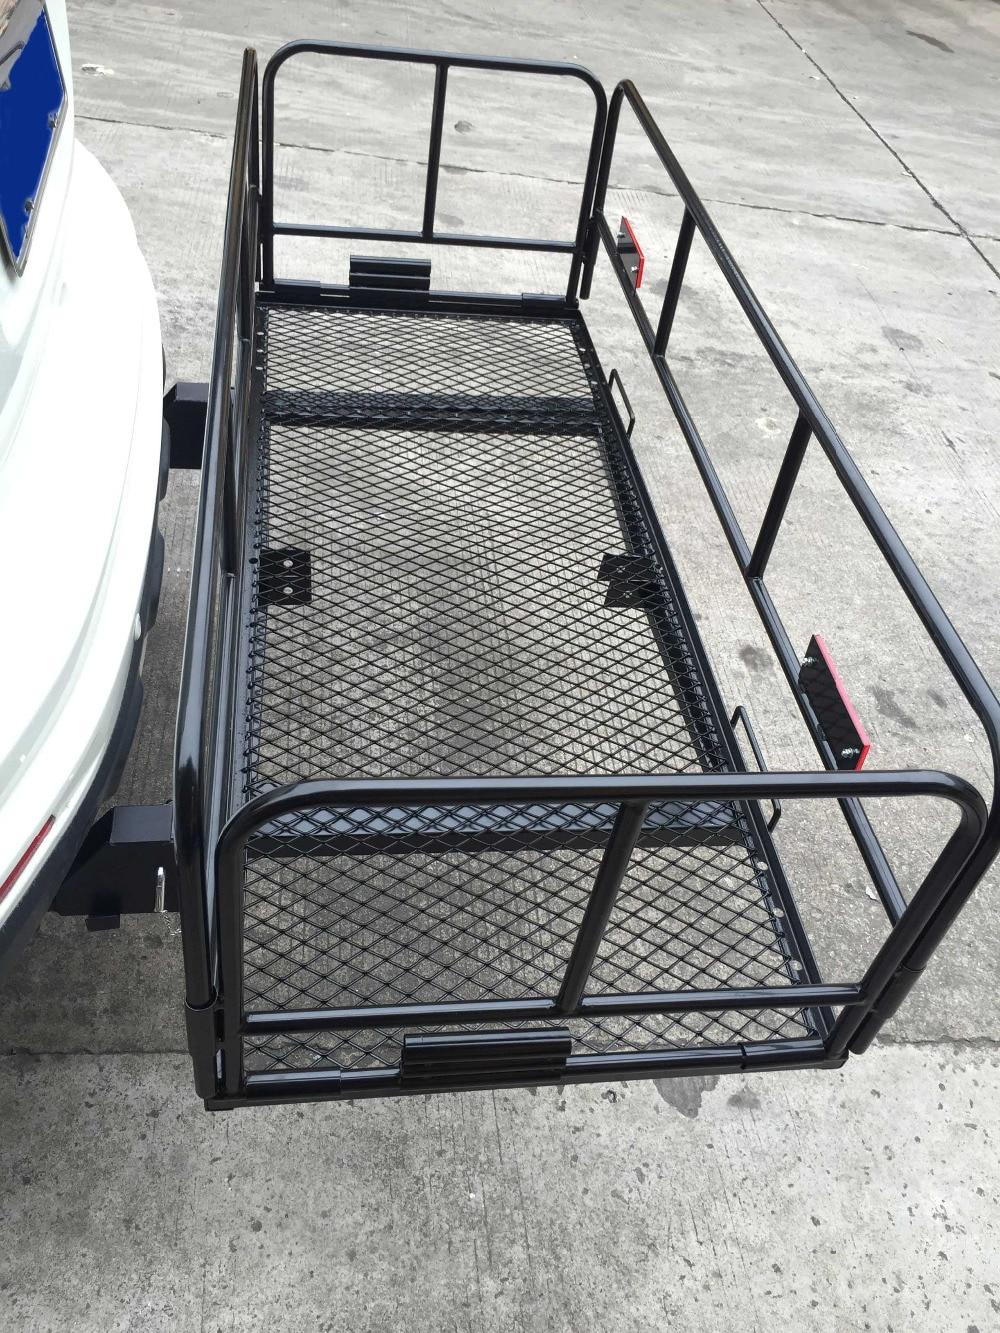 E2c 60 U0026quot  Folding Cargo Carrier 2  U0026quot  Hitch Mount Luggage Mesh